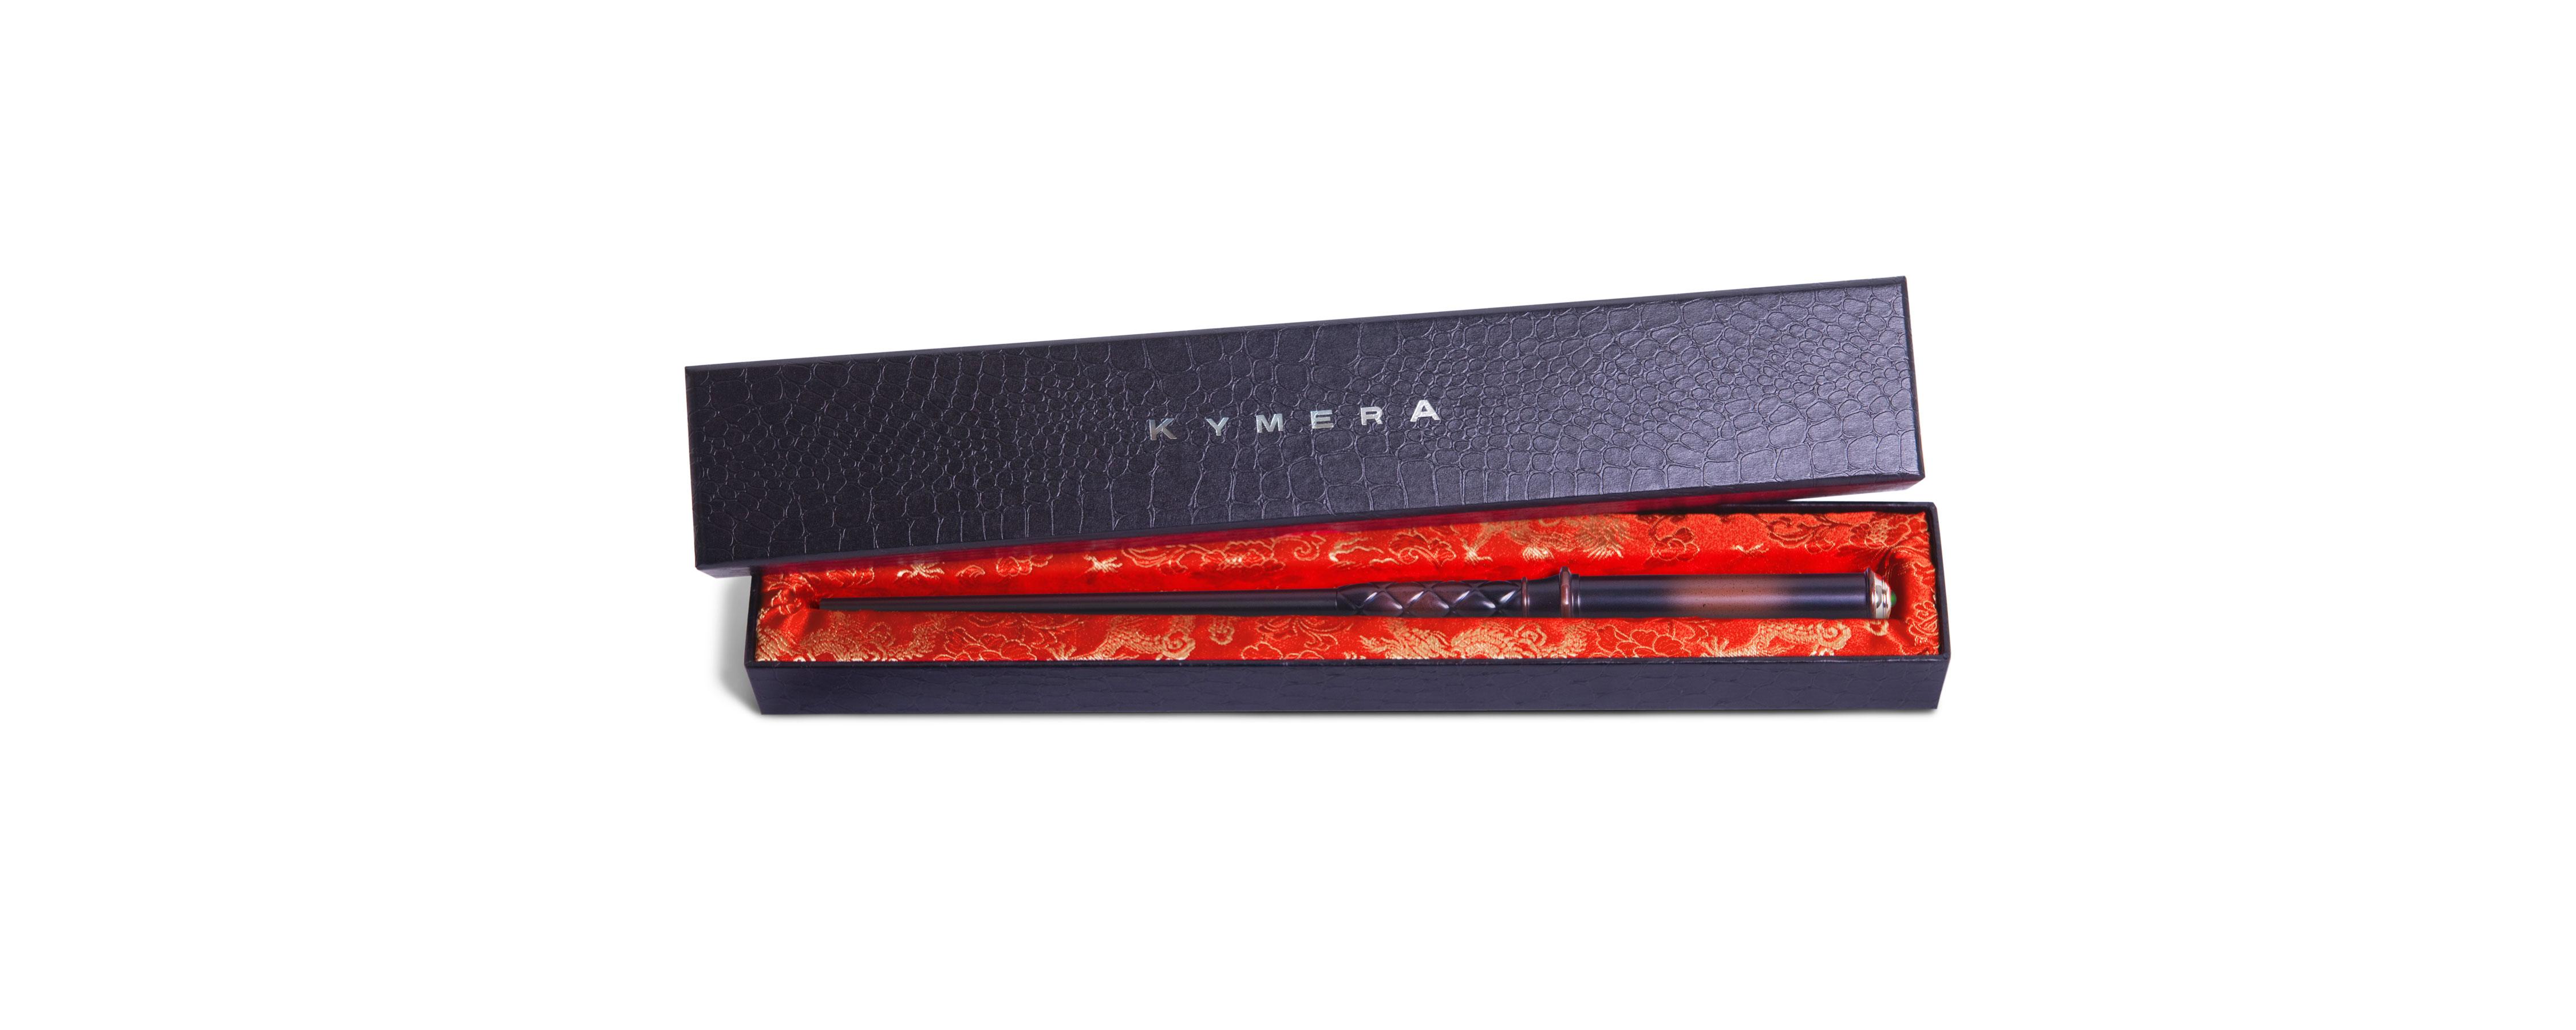 Kymera-Slider-wand-in-box